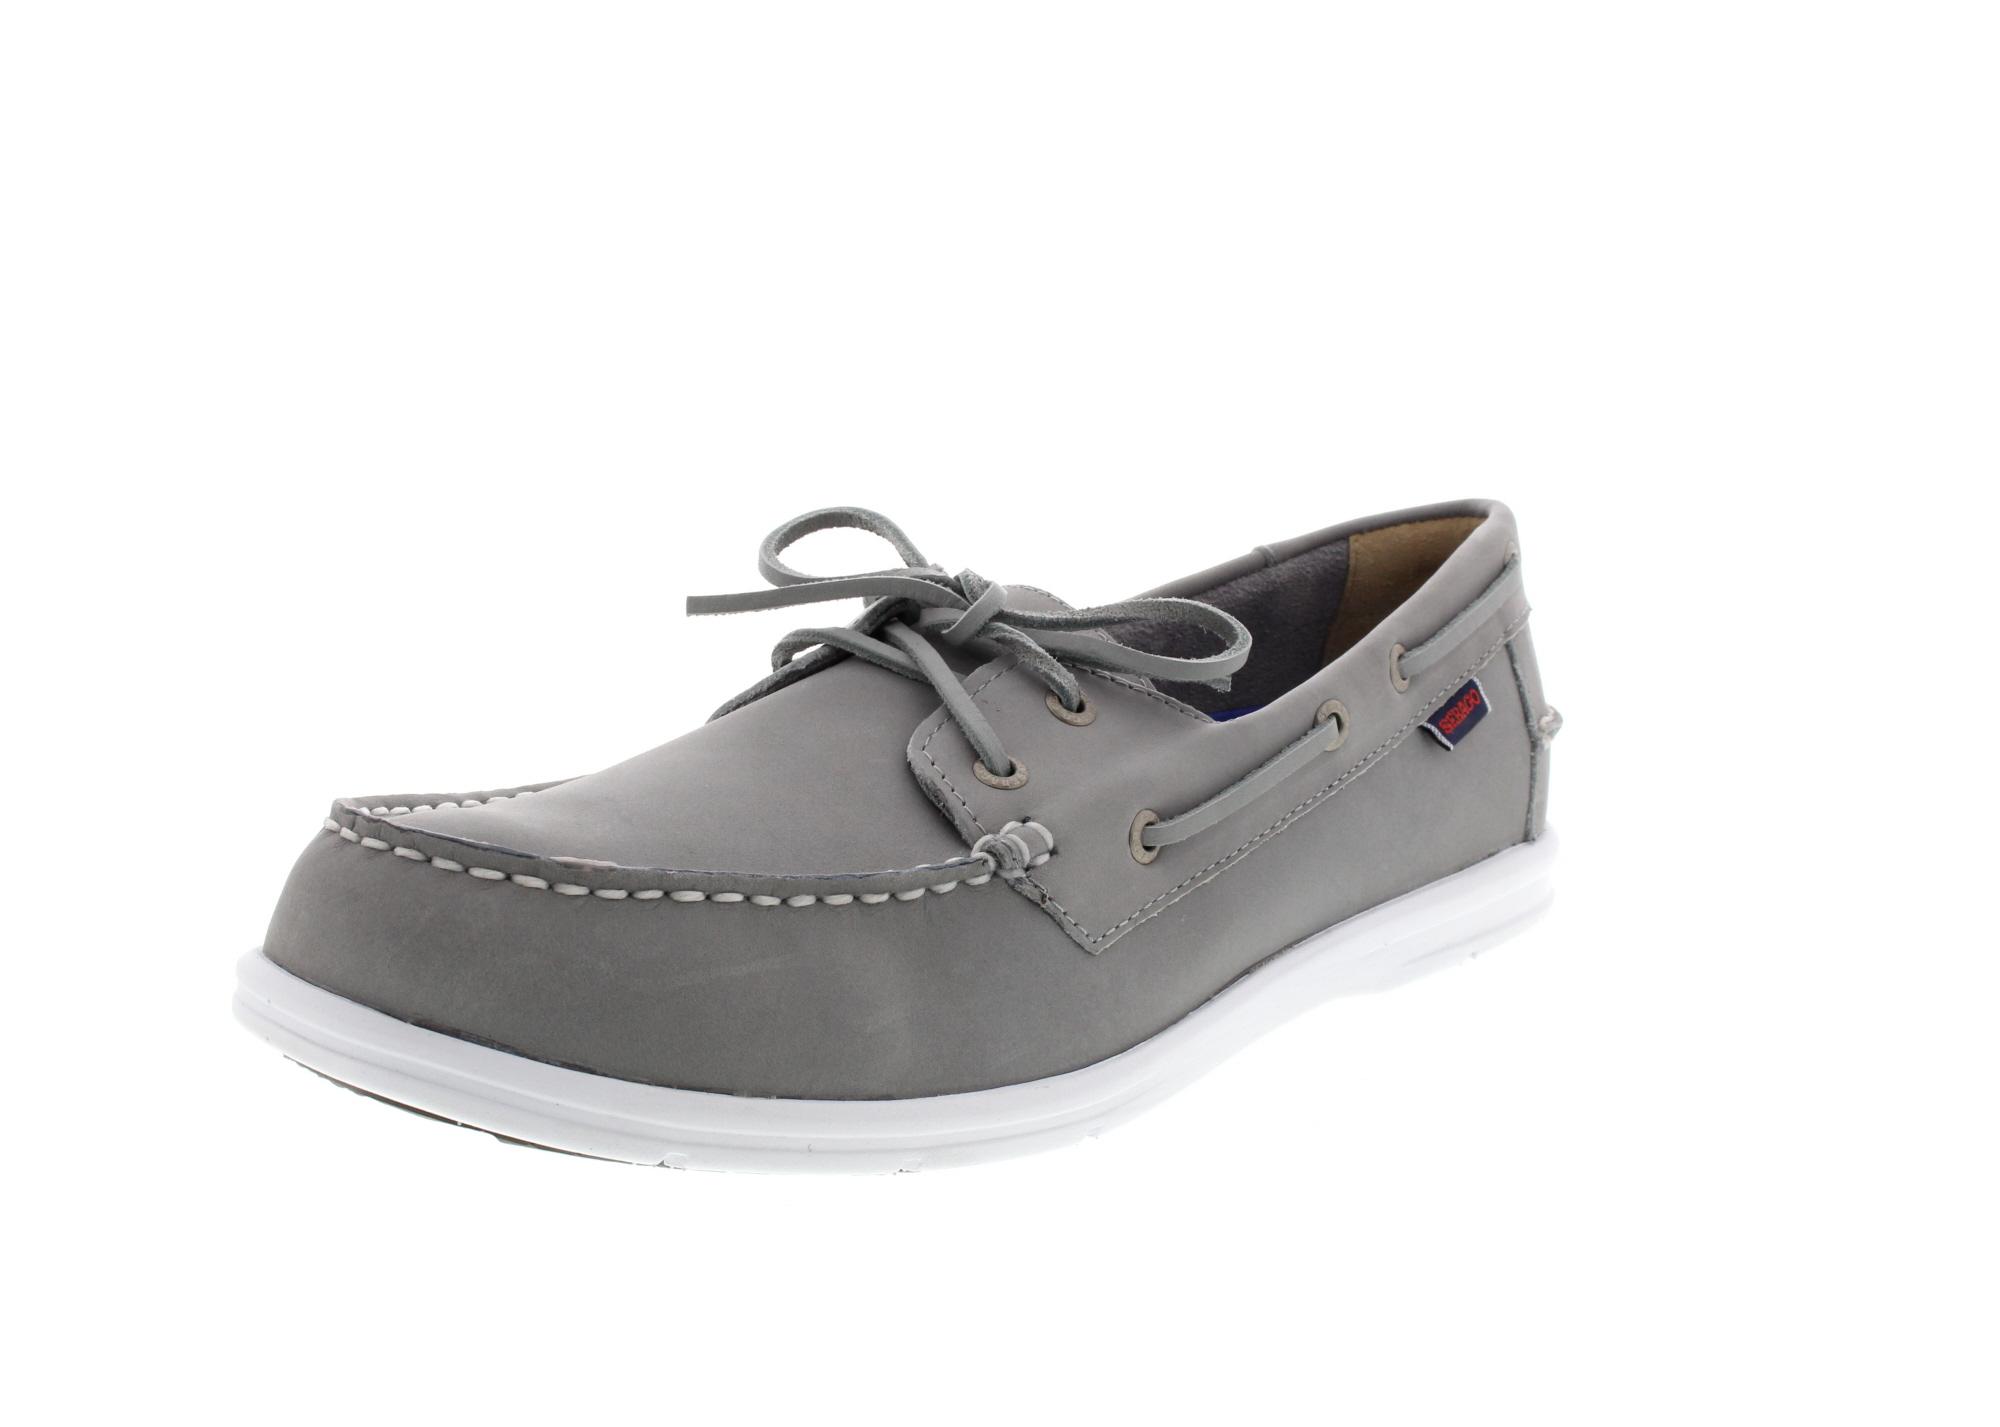 SEBAGO Schuhe in Übergröße - LITESIDES Two Eye - grey